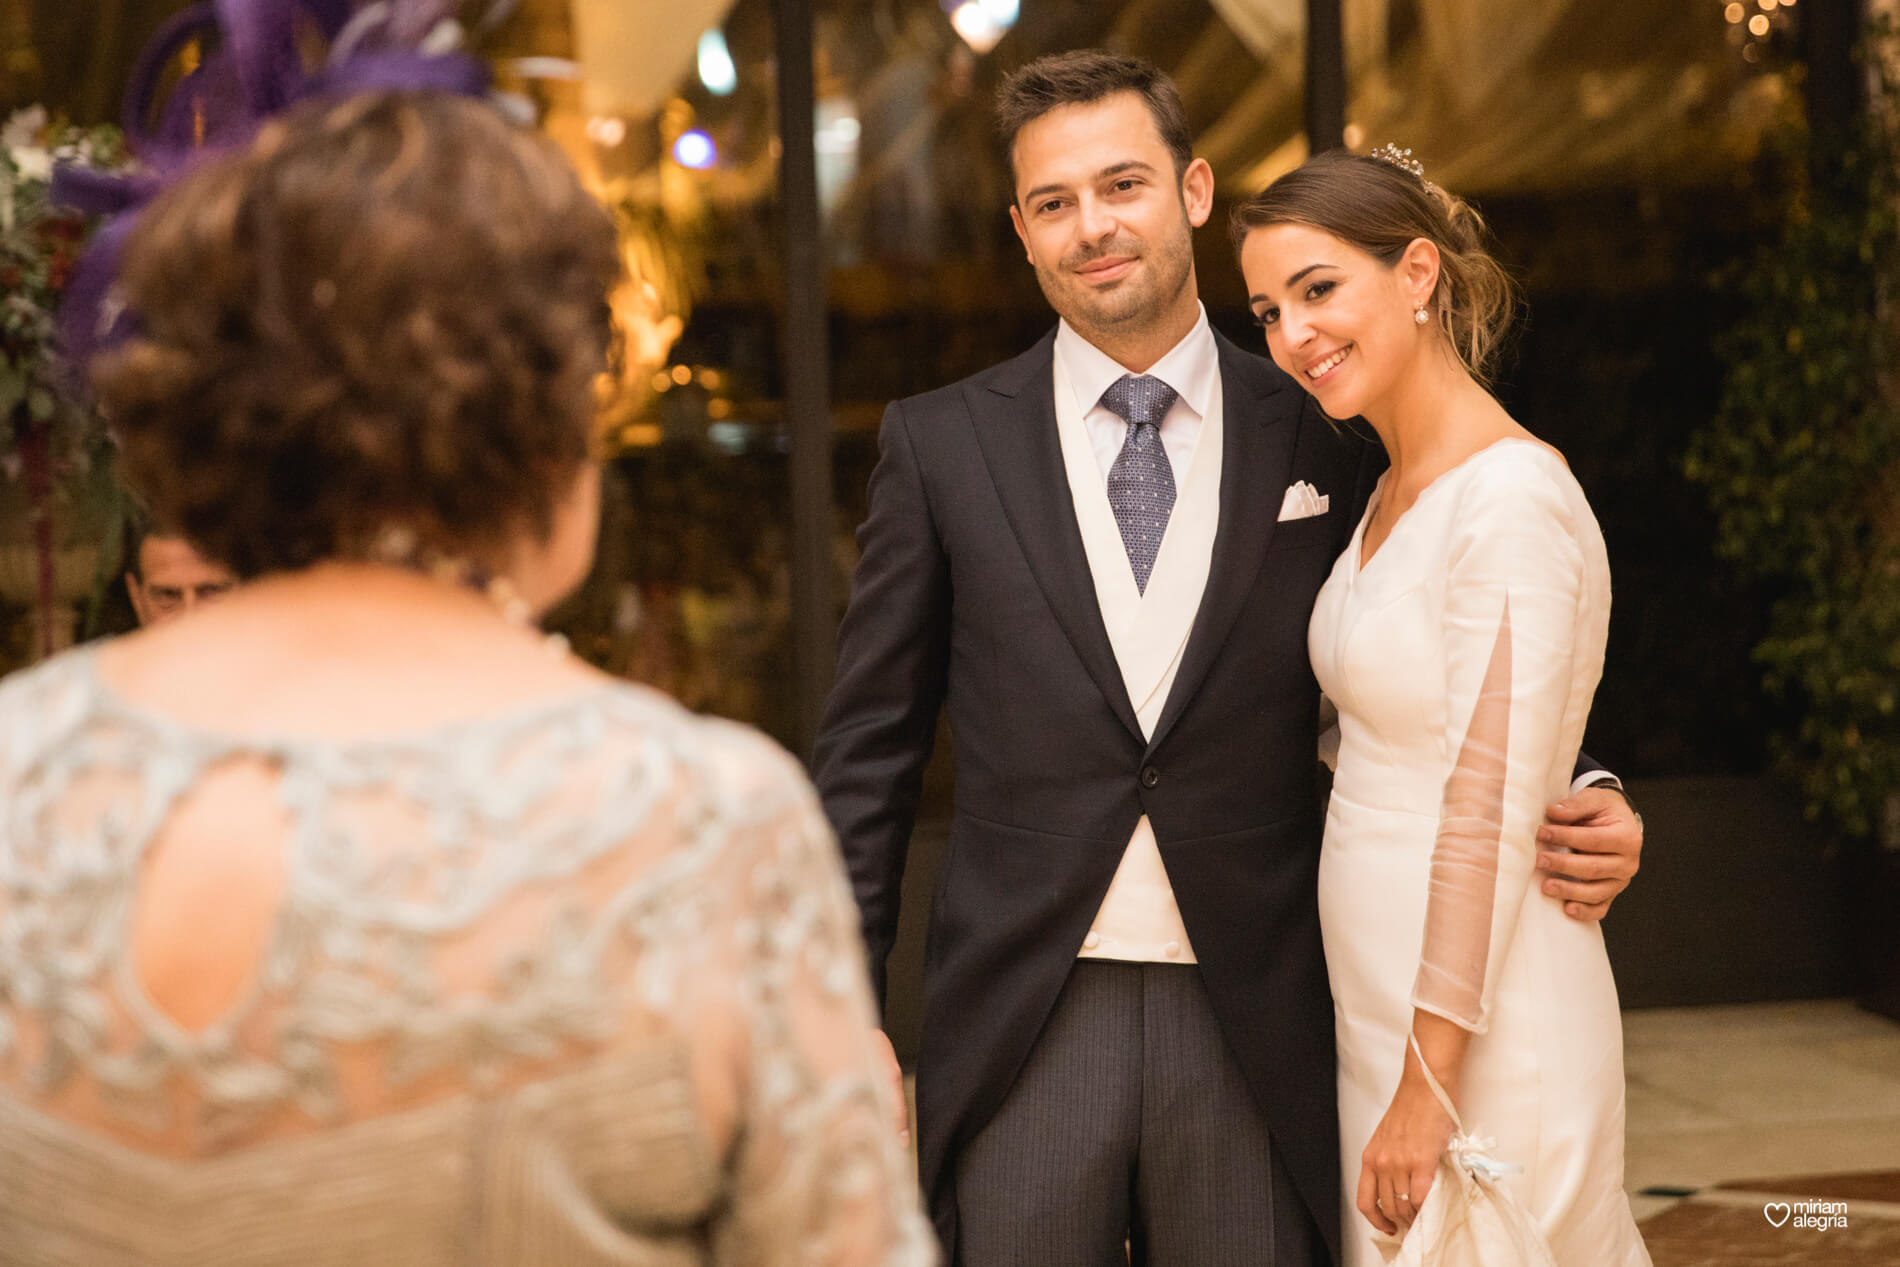 vestido-de-novia-paula-del-vas-miriam-alegria-fotografos-boda-murcia-146